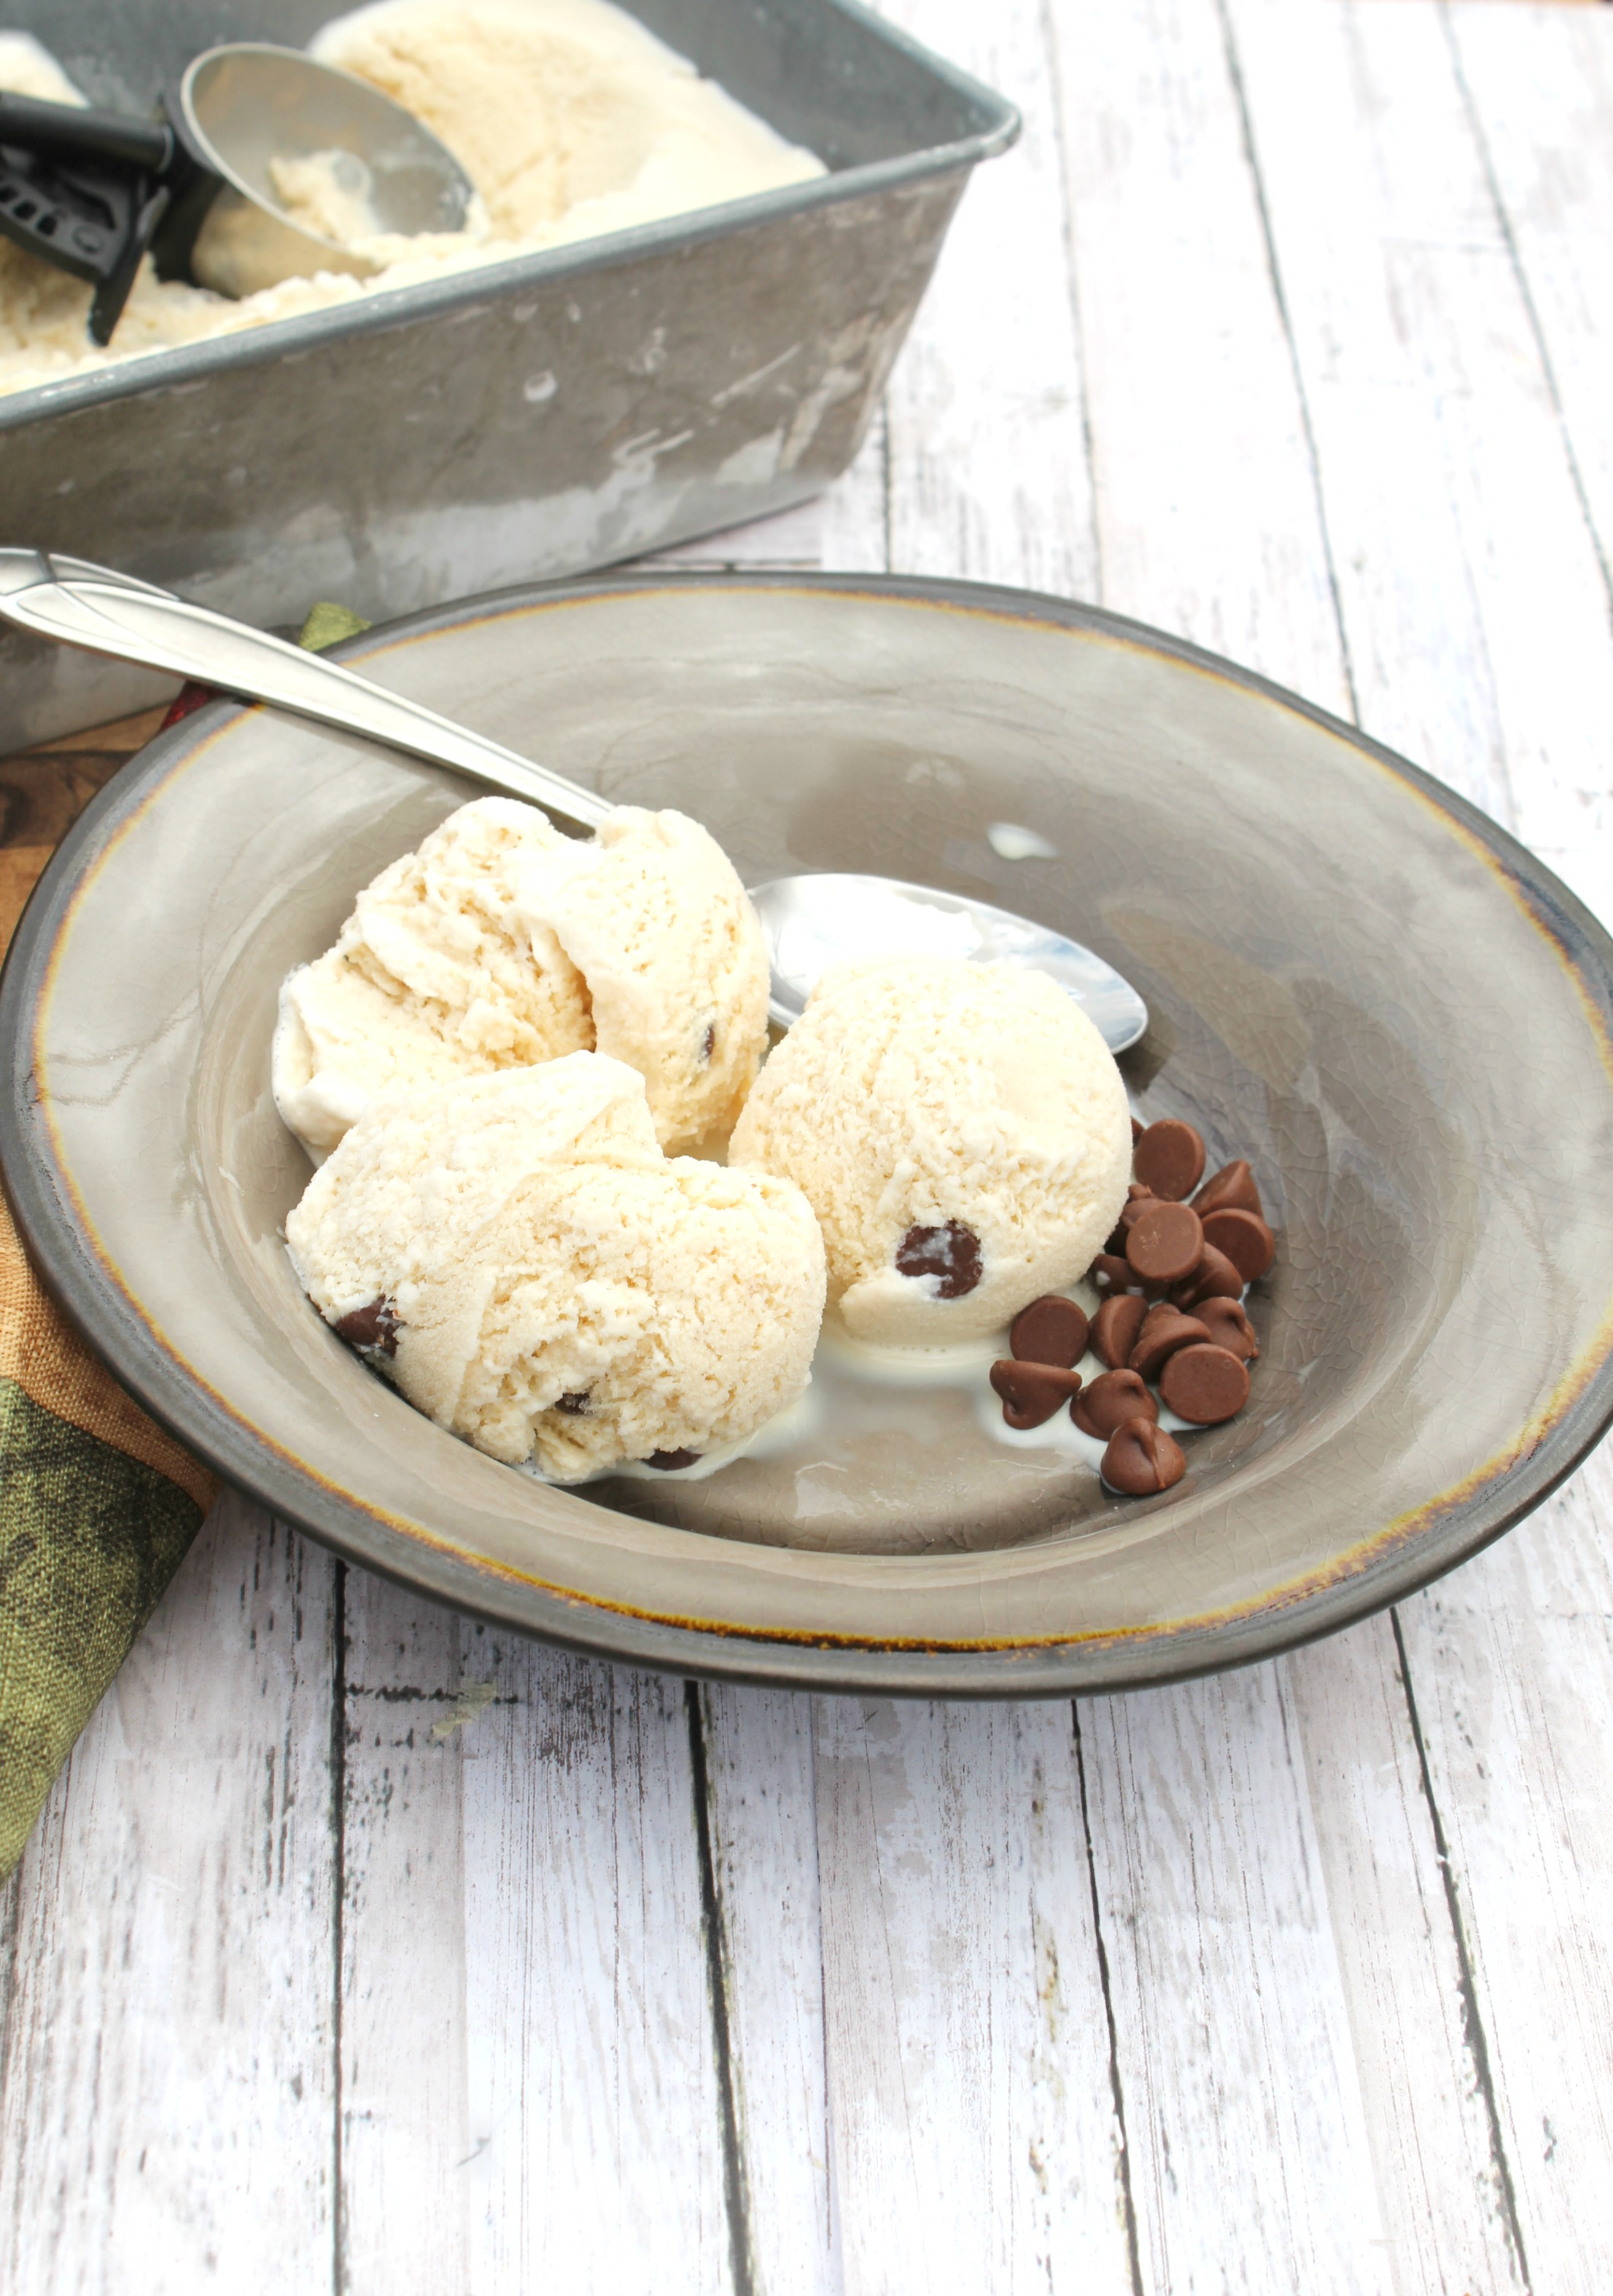 Homemade Coffee Ice Cream with Chocolate Chips